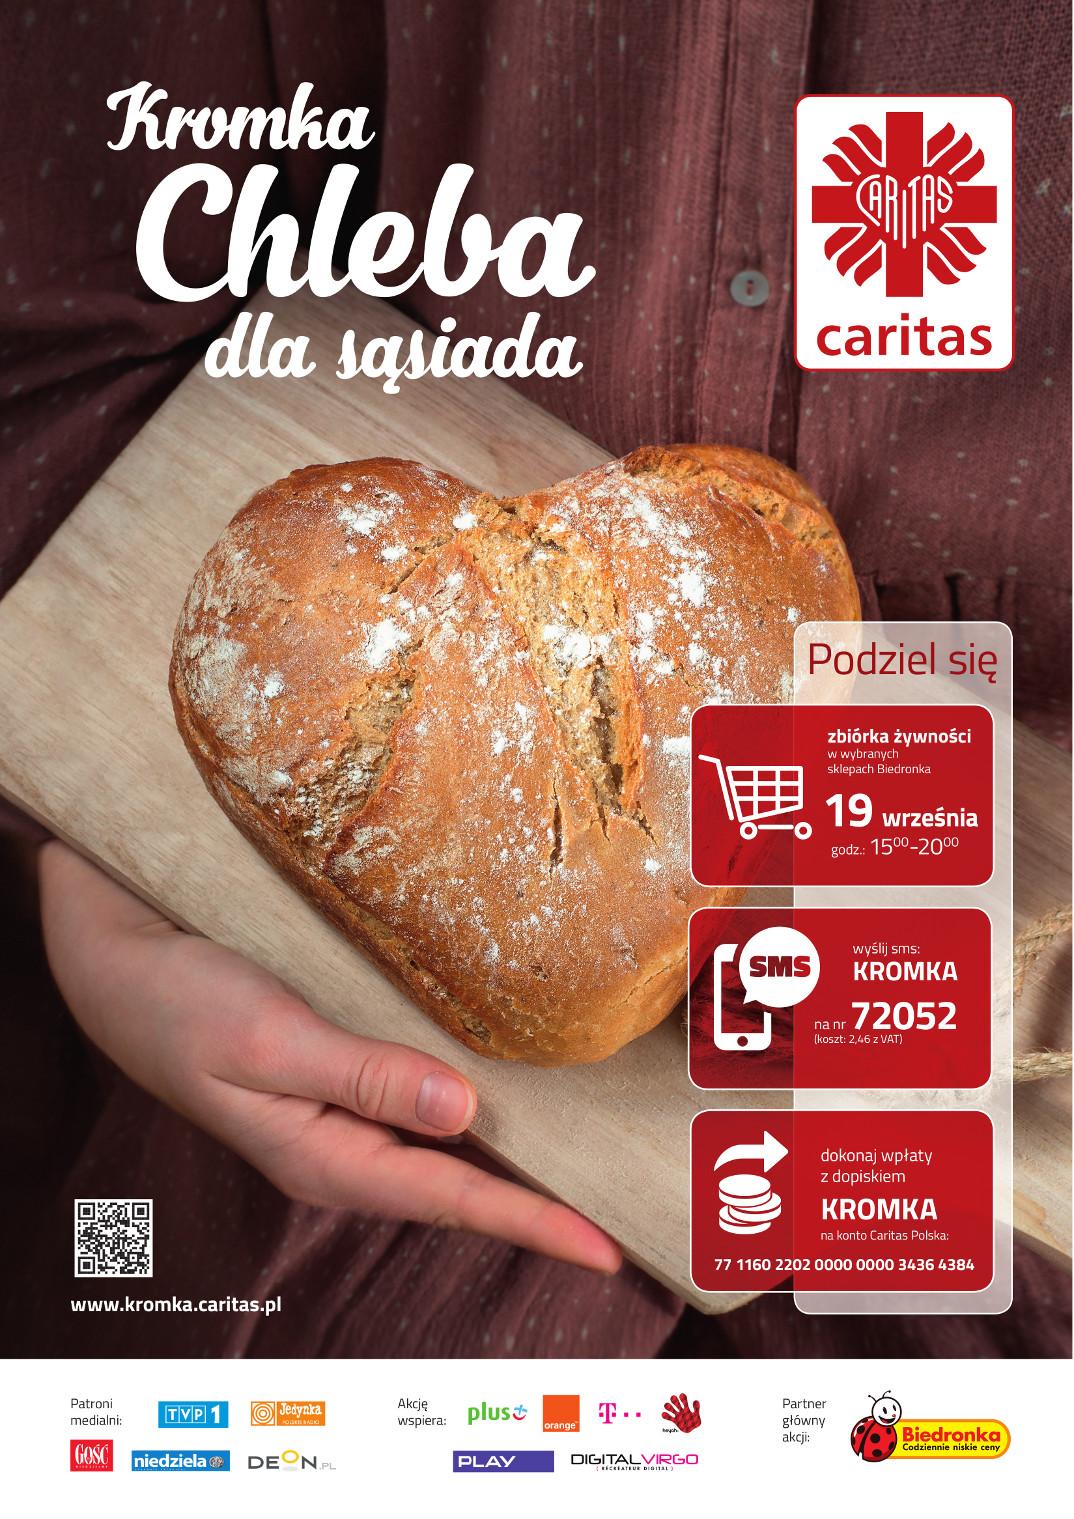 Kromka Chleba 2017